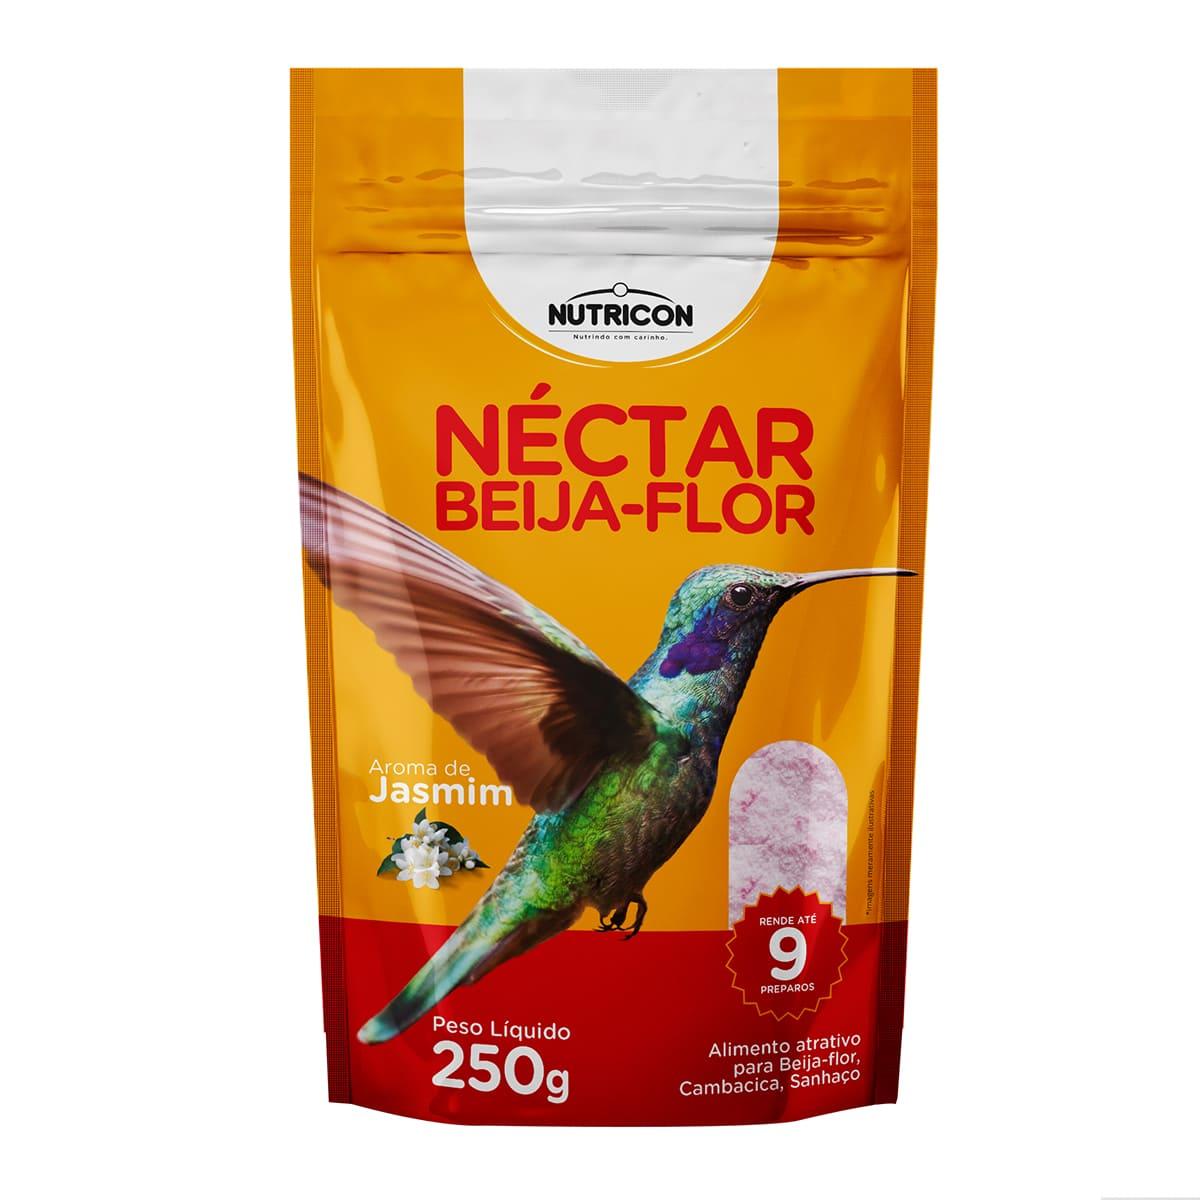 Nutricon Néctar para Beija-Flor 250g - Alimento atrativo